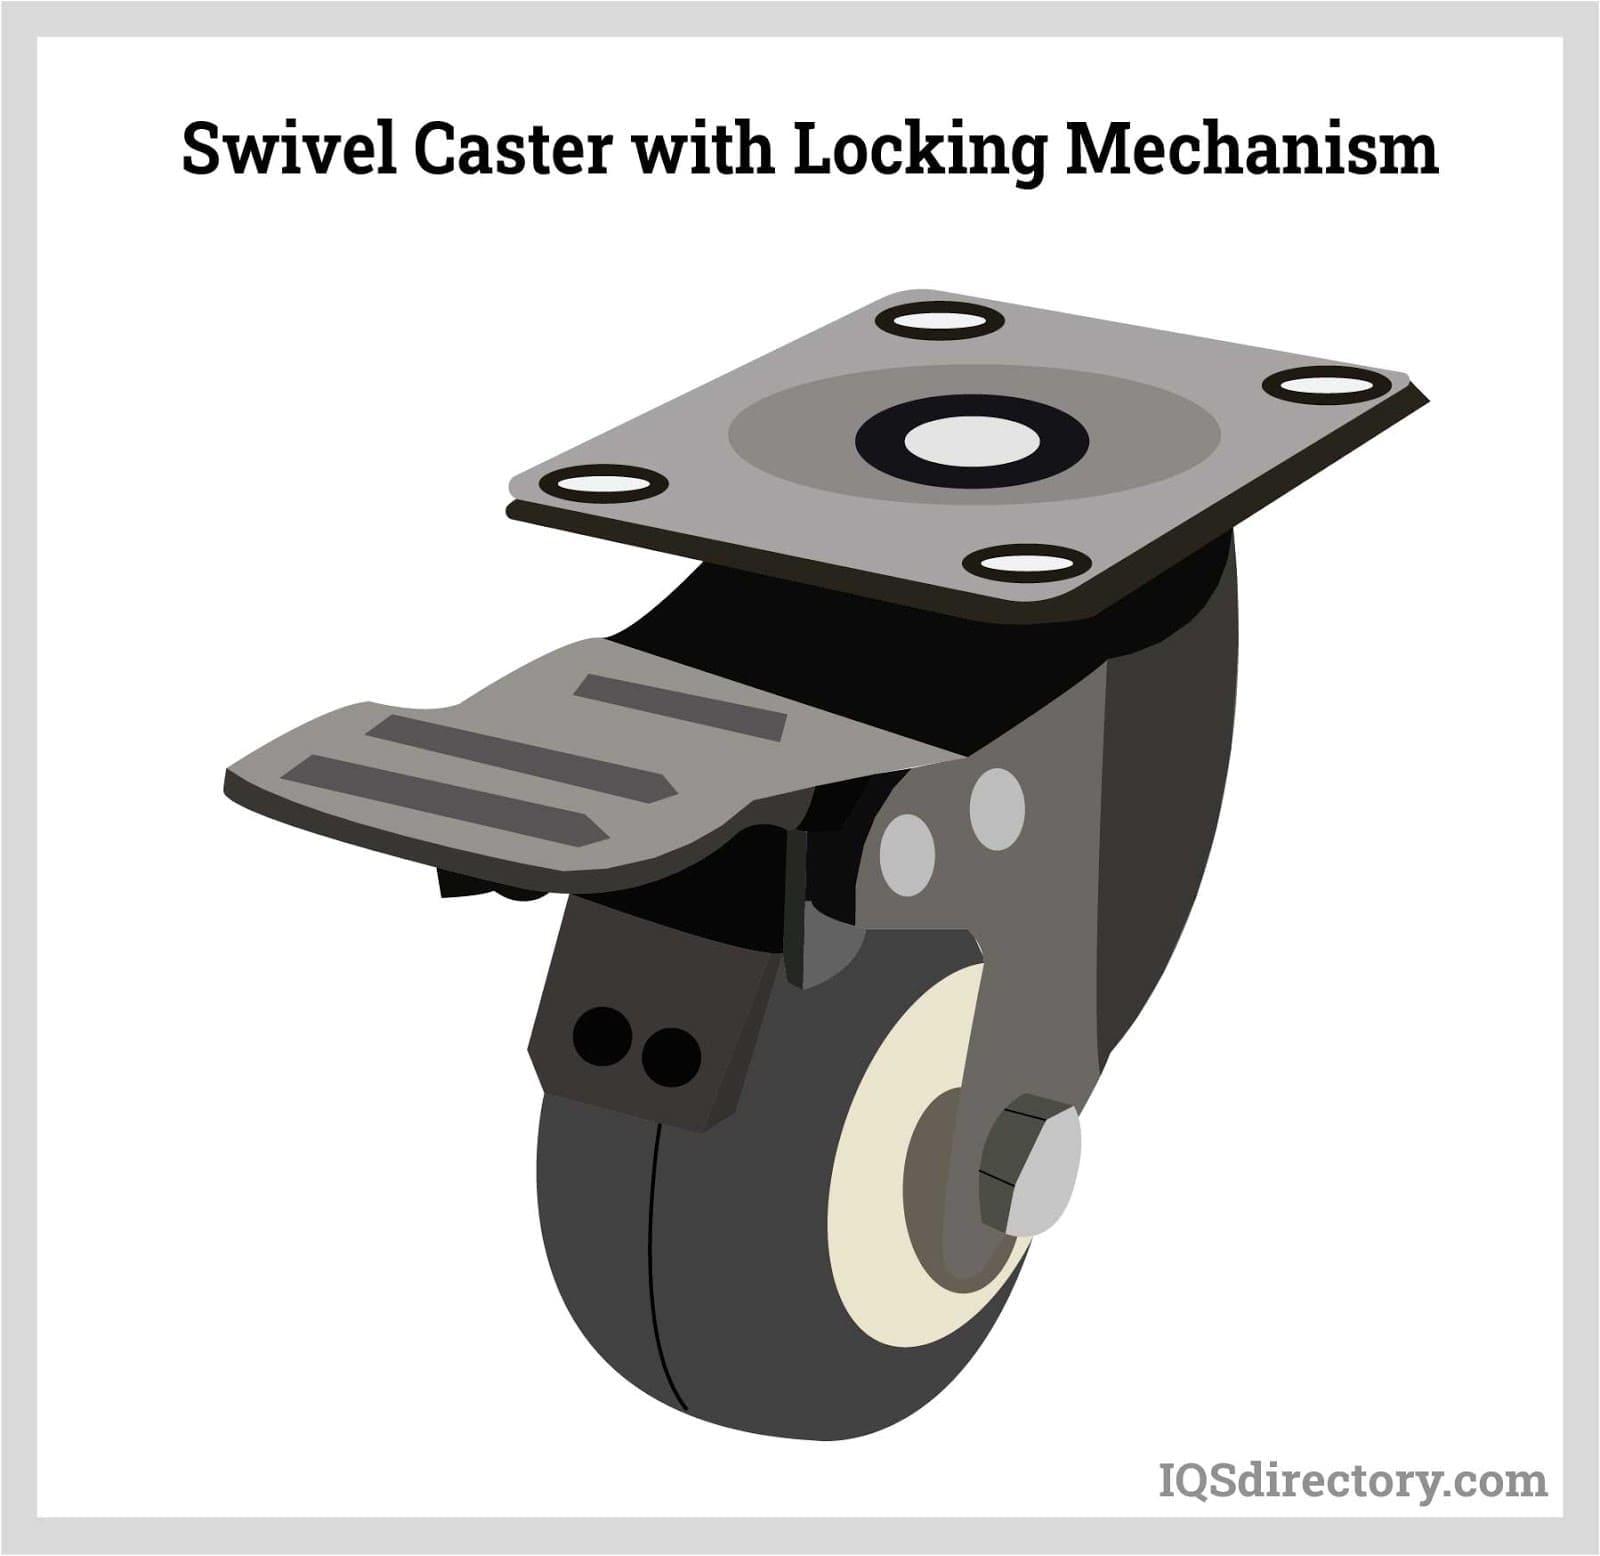 Swivel Caster with Locking Mechanism